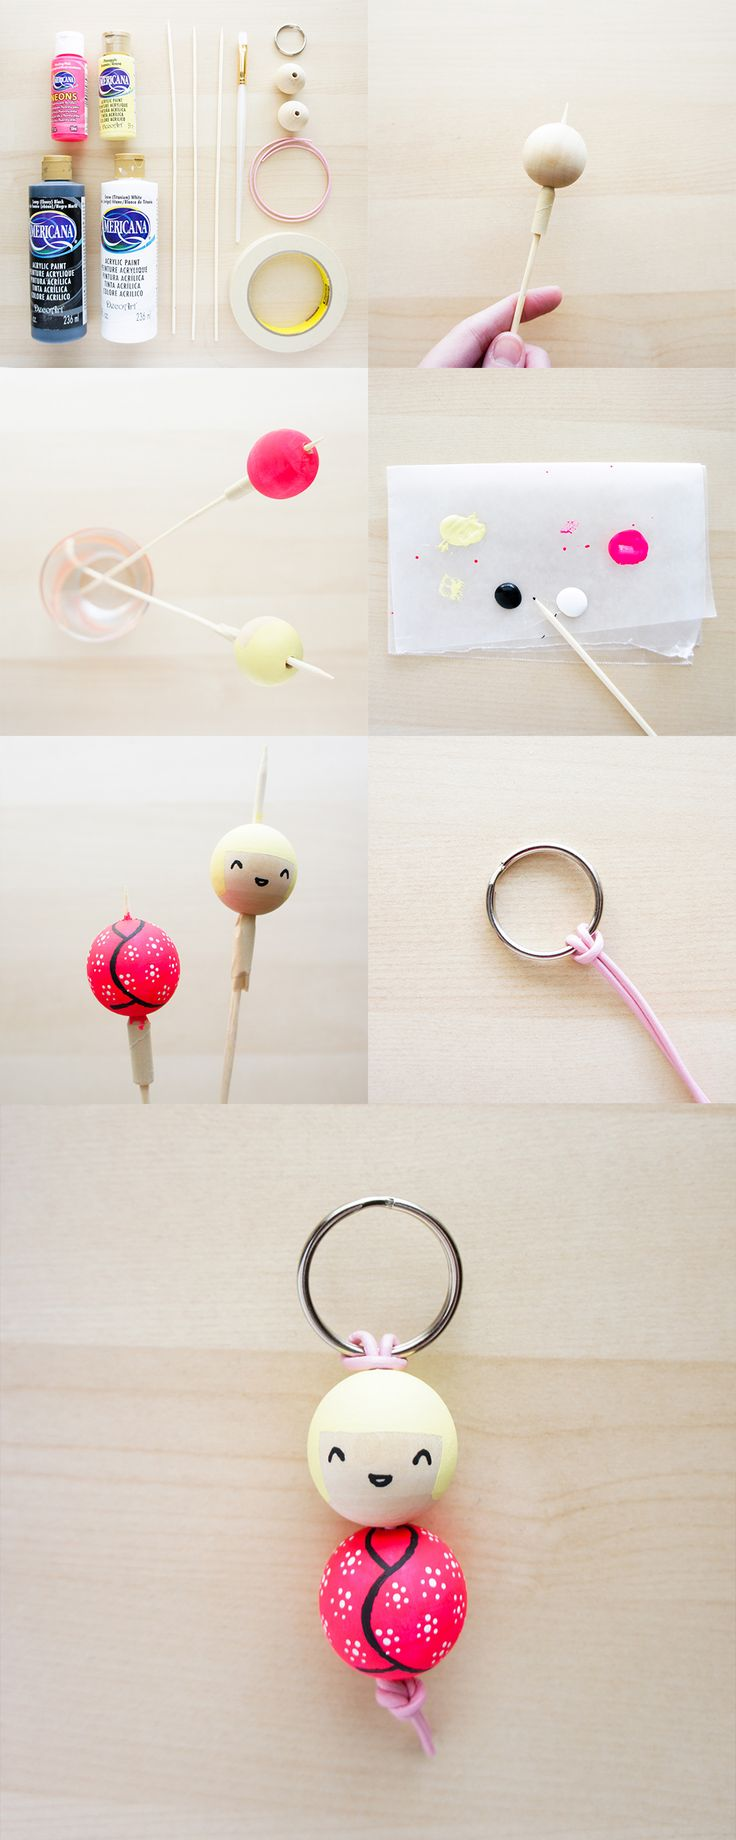 DY Painted Bead Key Chain • via The Pink Samurai